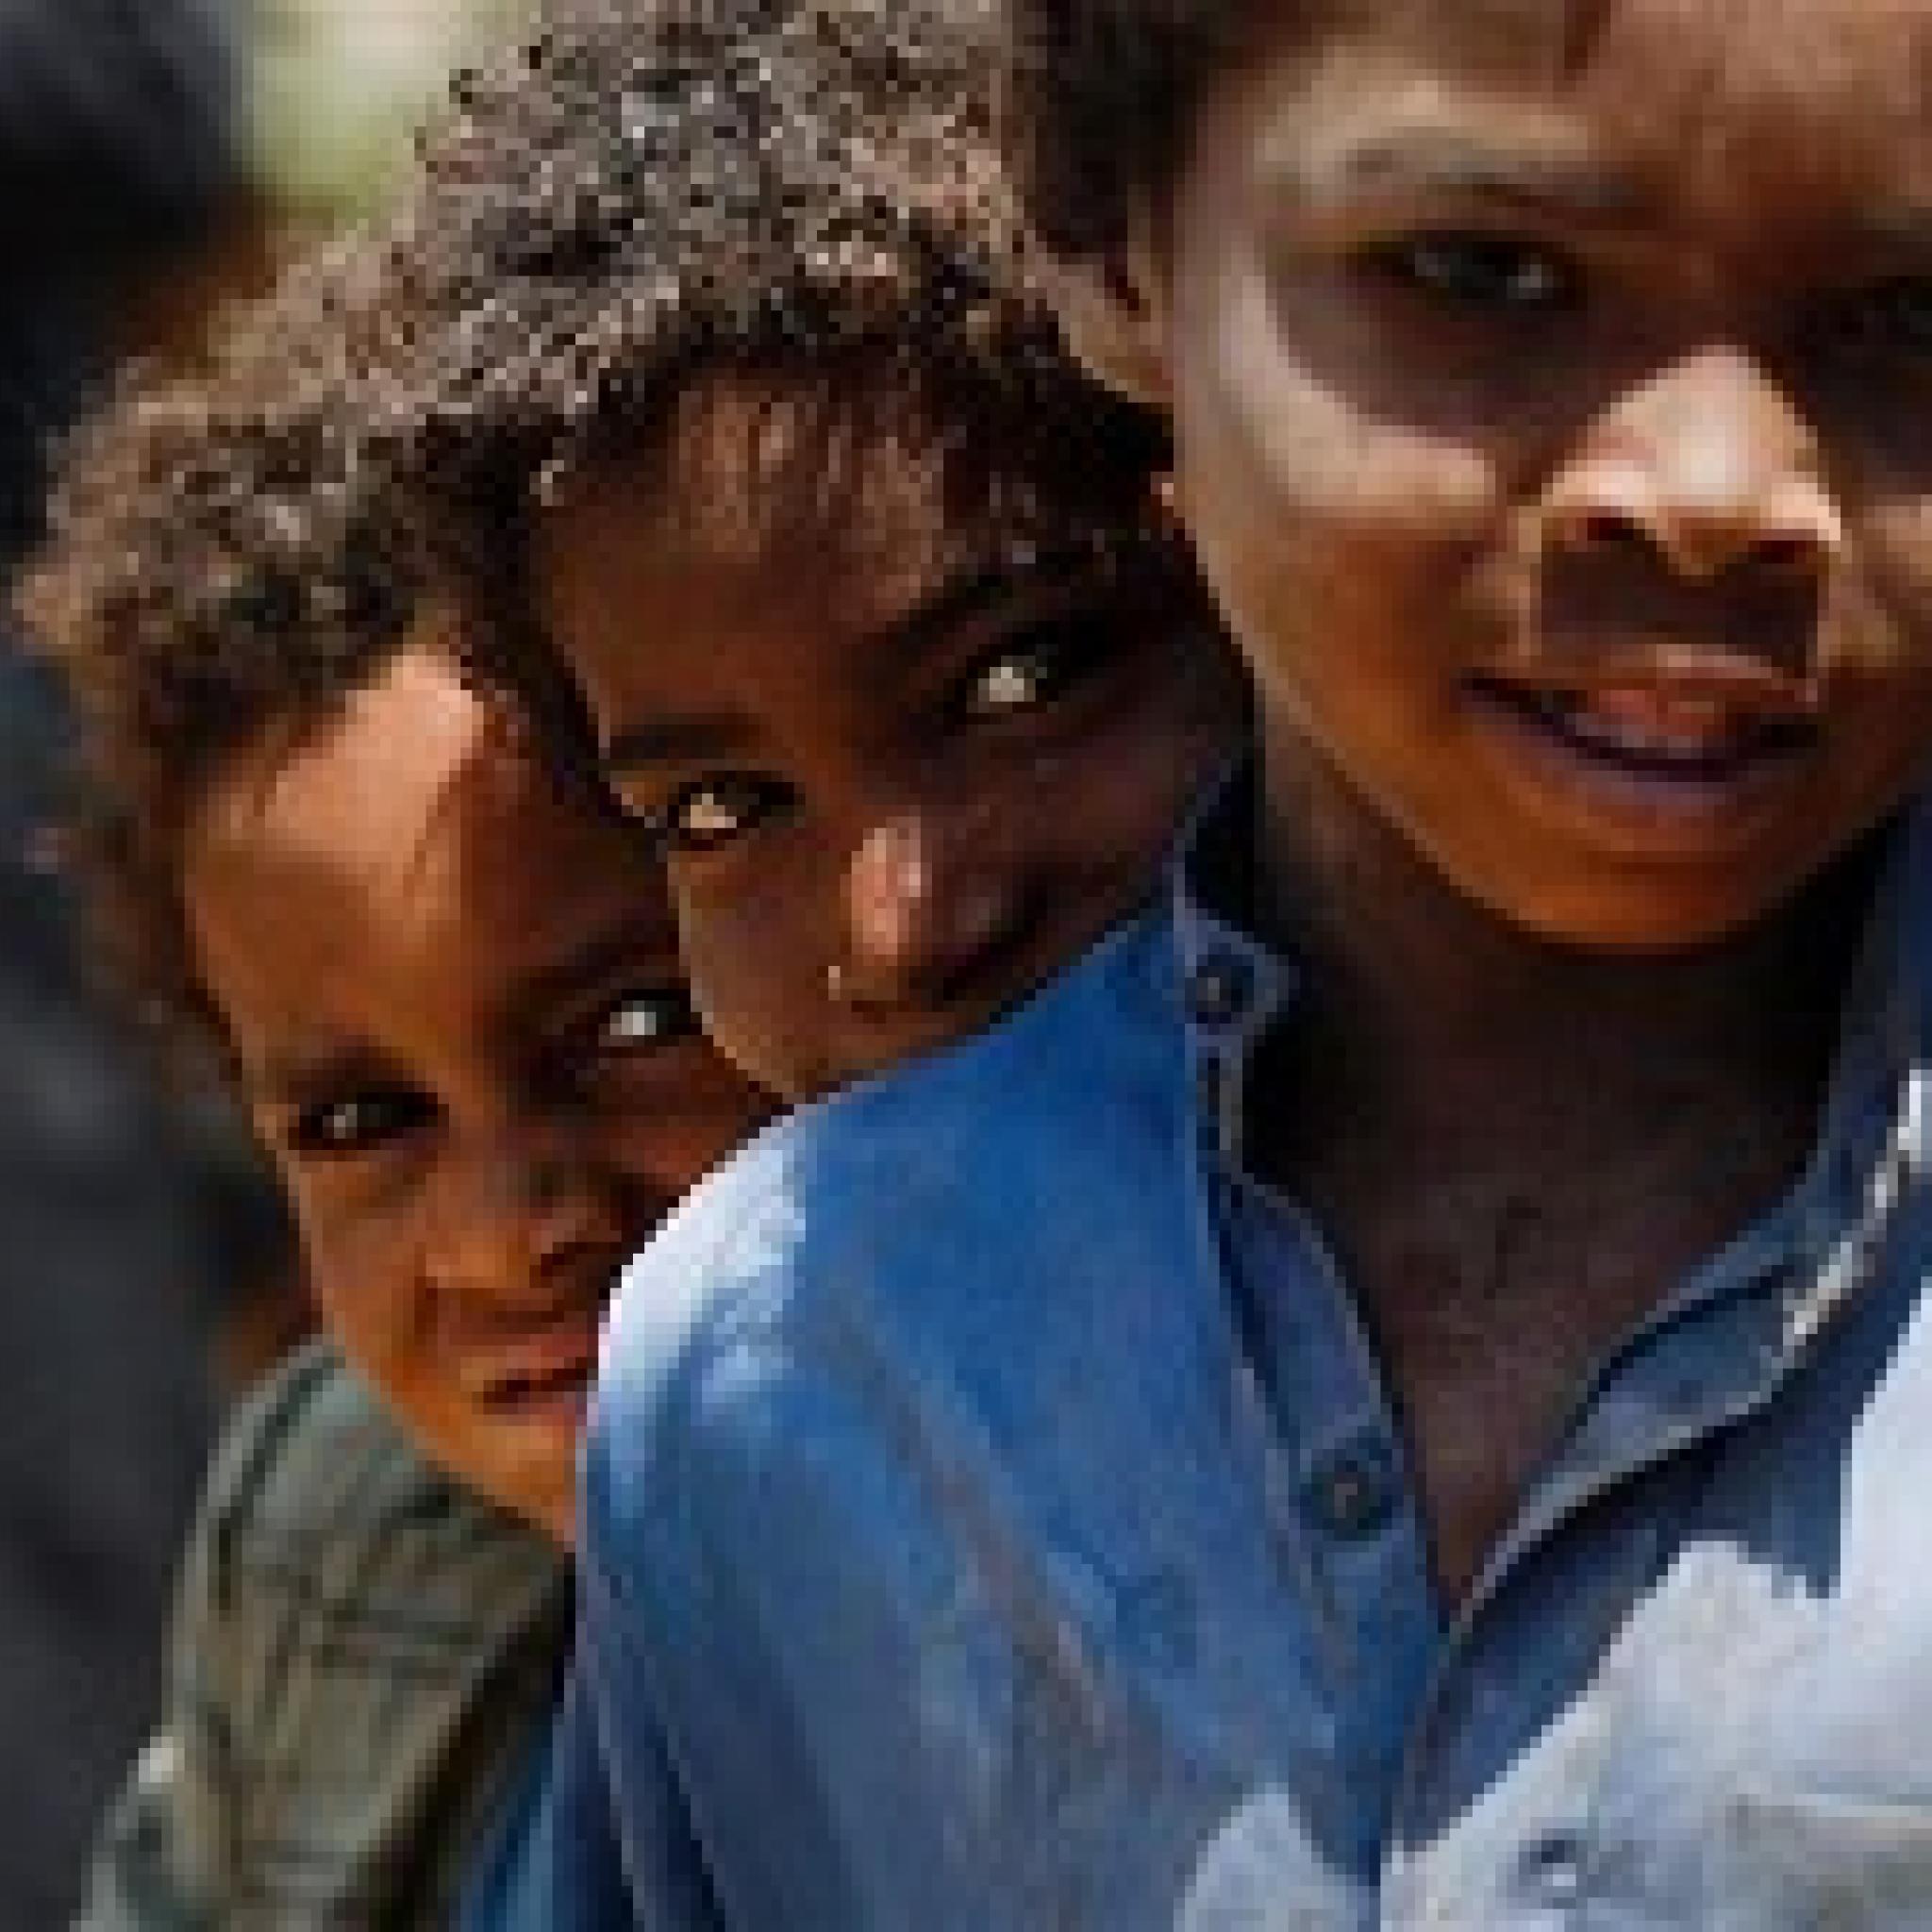 NEWS: በየመን ጦርነት ከ5 ሺህ በላይ ህፃናት ሞተዋል- ዩኒሴፍ - UNICEF: Over 5,000 Kids Killed by Saudi War on Yemen